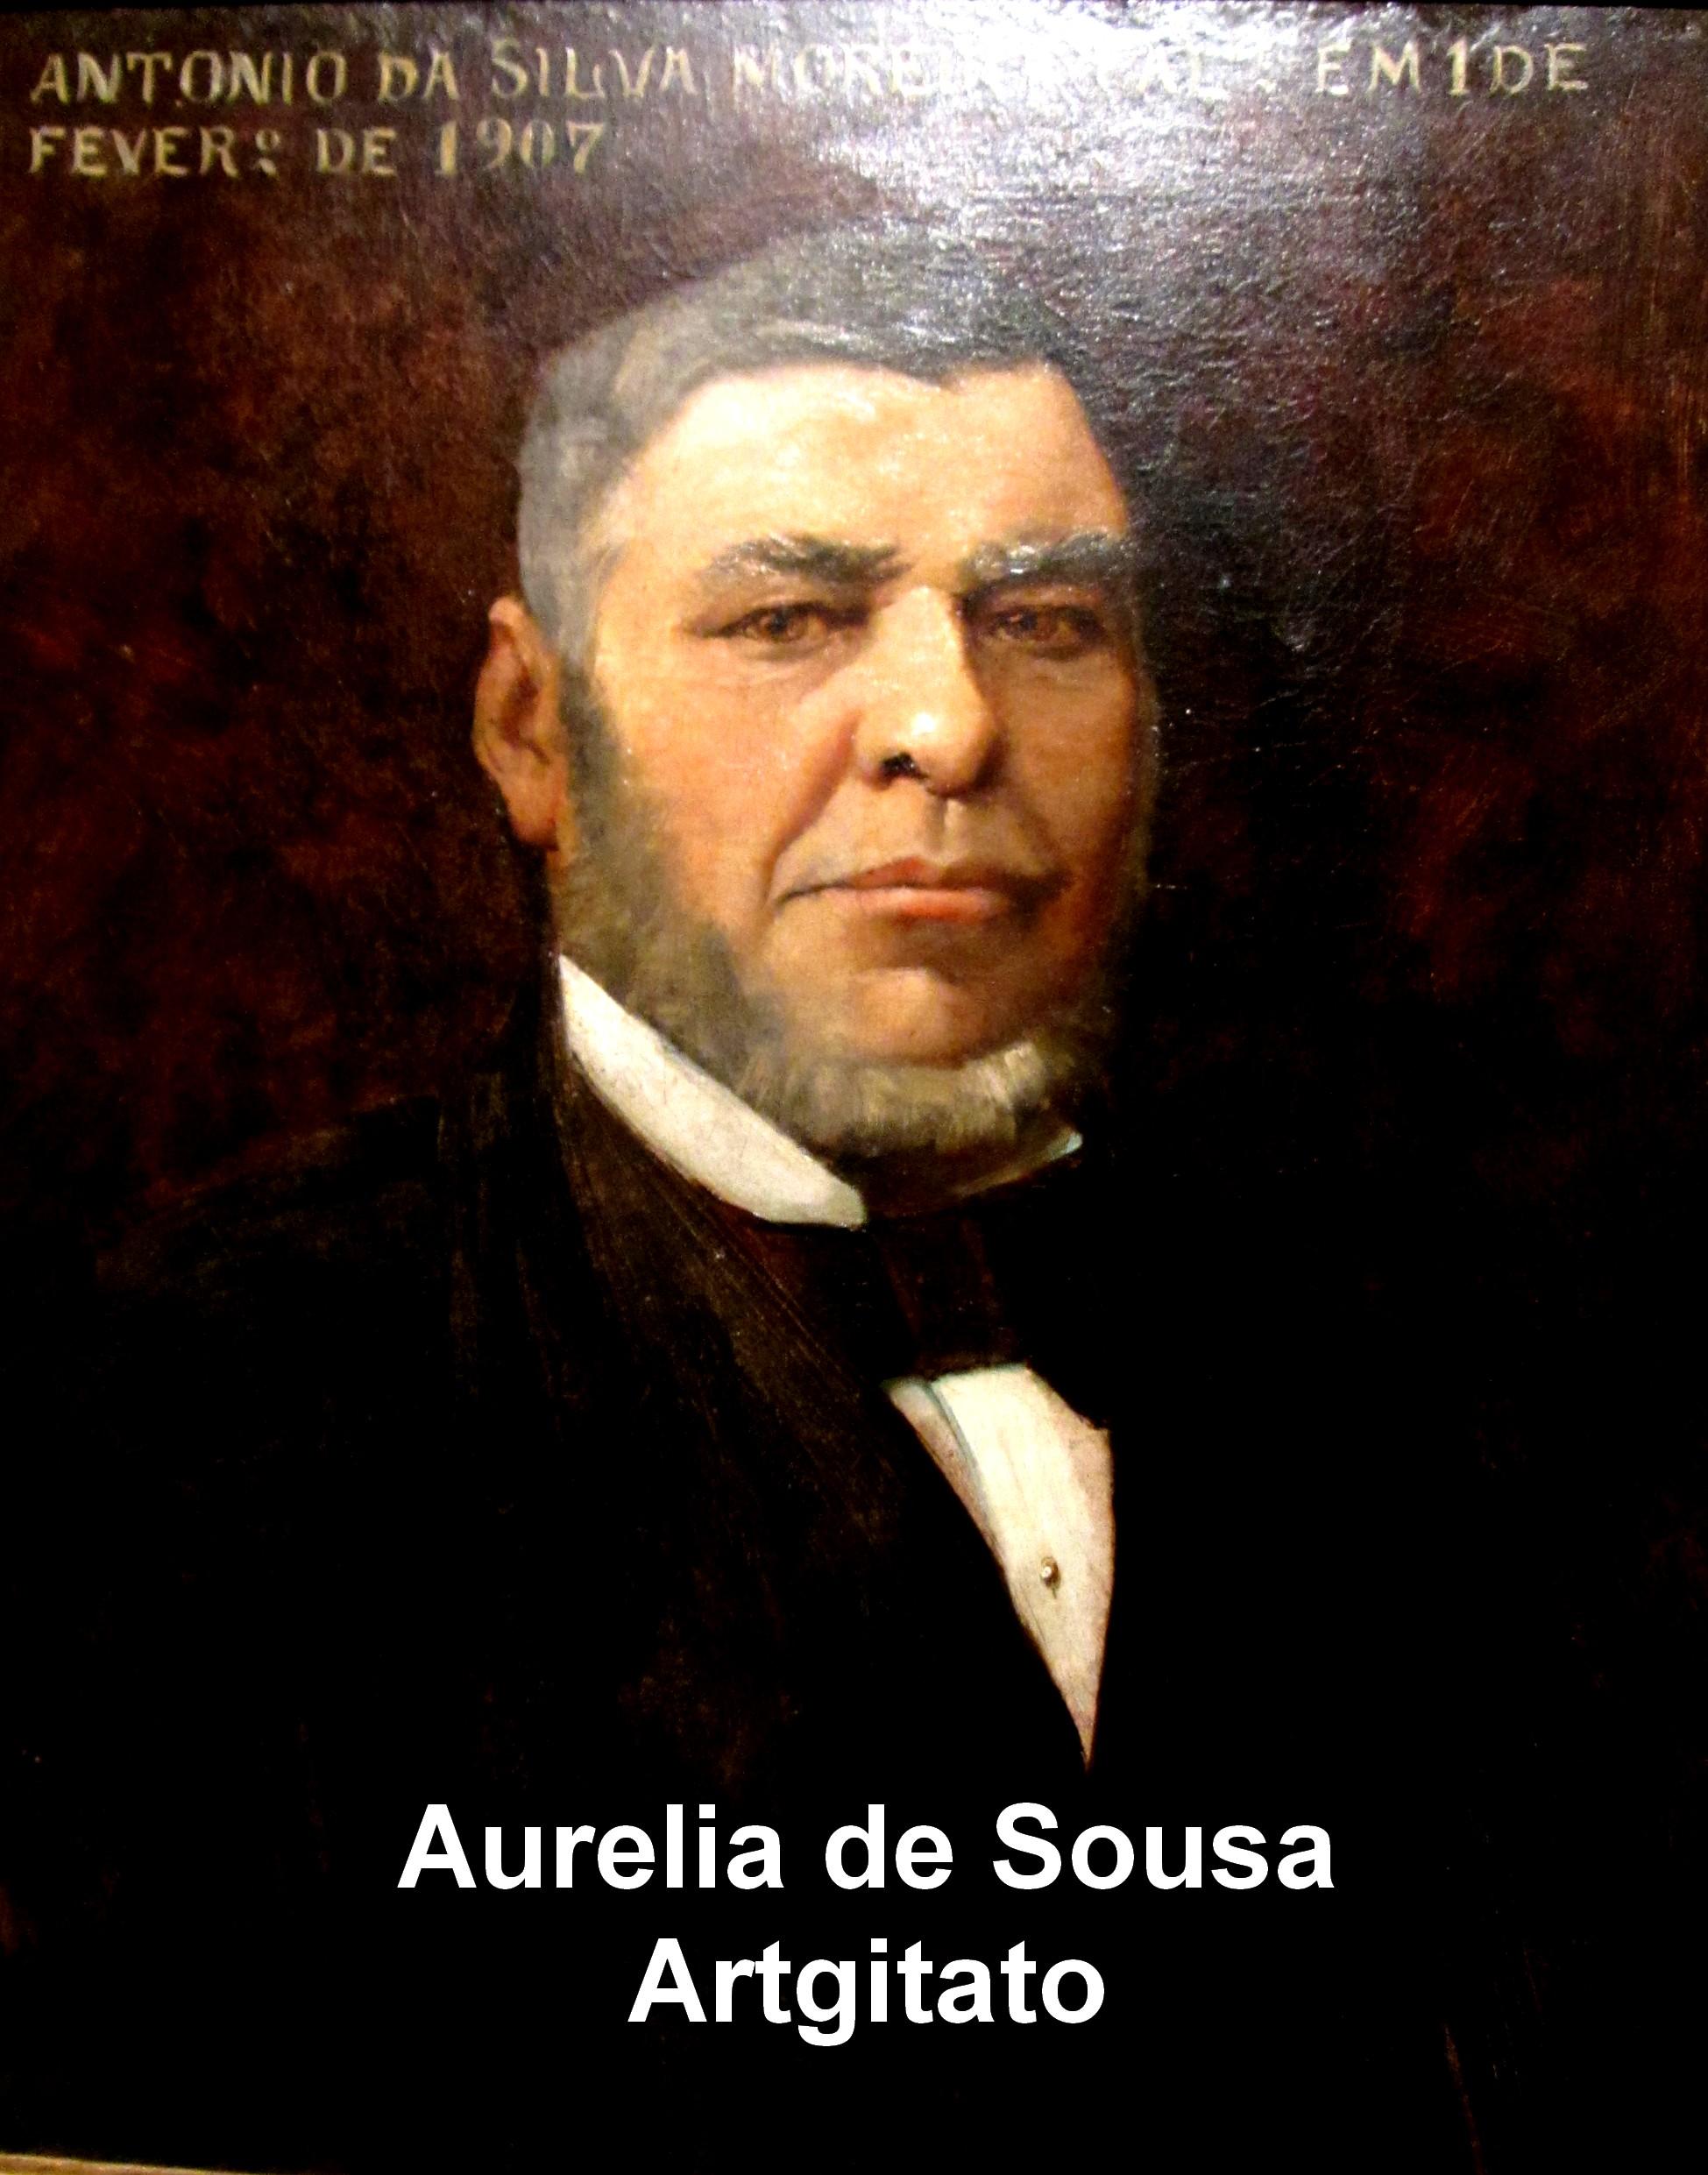 <b>aurelia-de-sousa</b>-casa-museu-marta-ortigao-sampaio- - AURELIA-DE-SOUSA-CASA-MUSEU-MARTA-ORTIG%C3%83O-SAMPAIO-Artgitat0-34